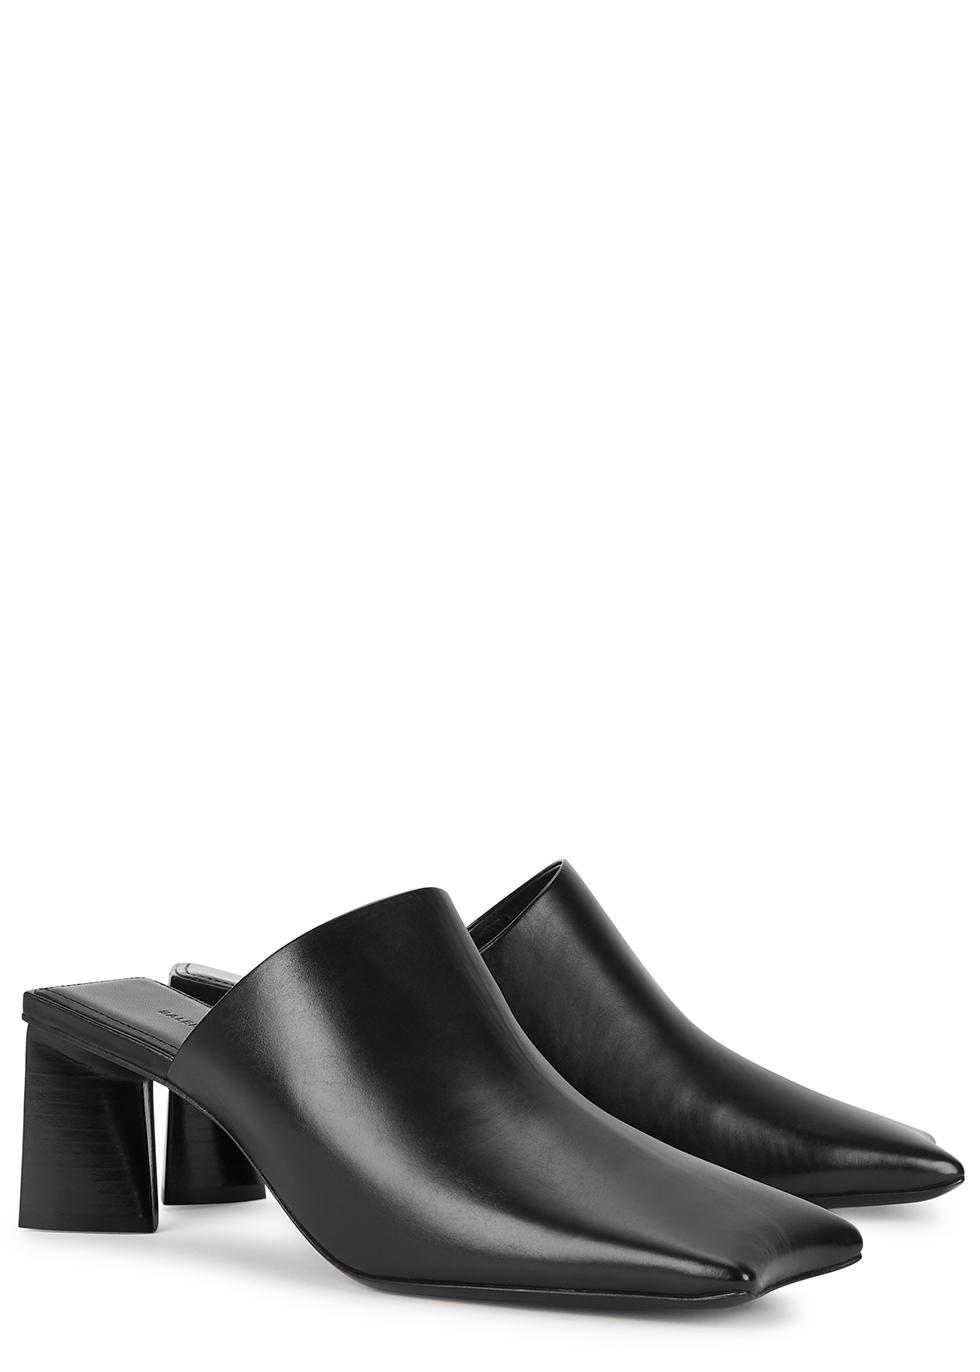 Balenciaga Moon 60 black leather mules